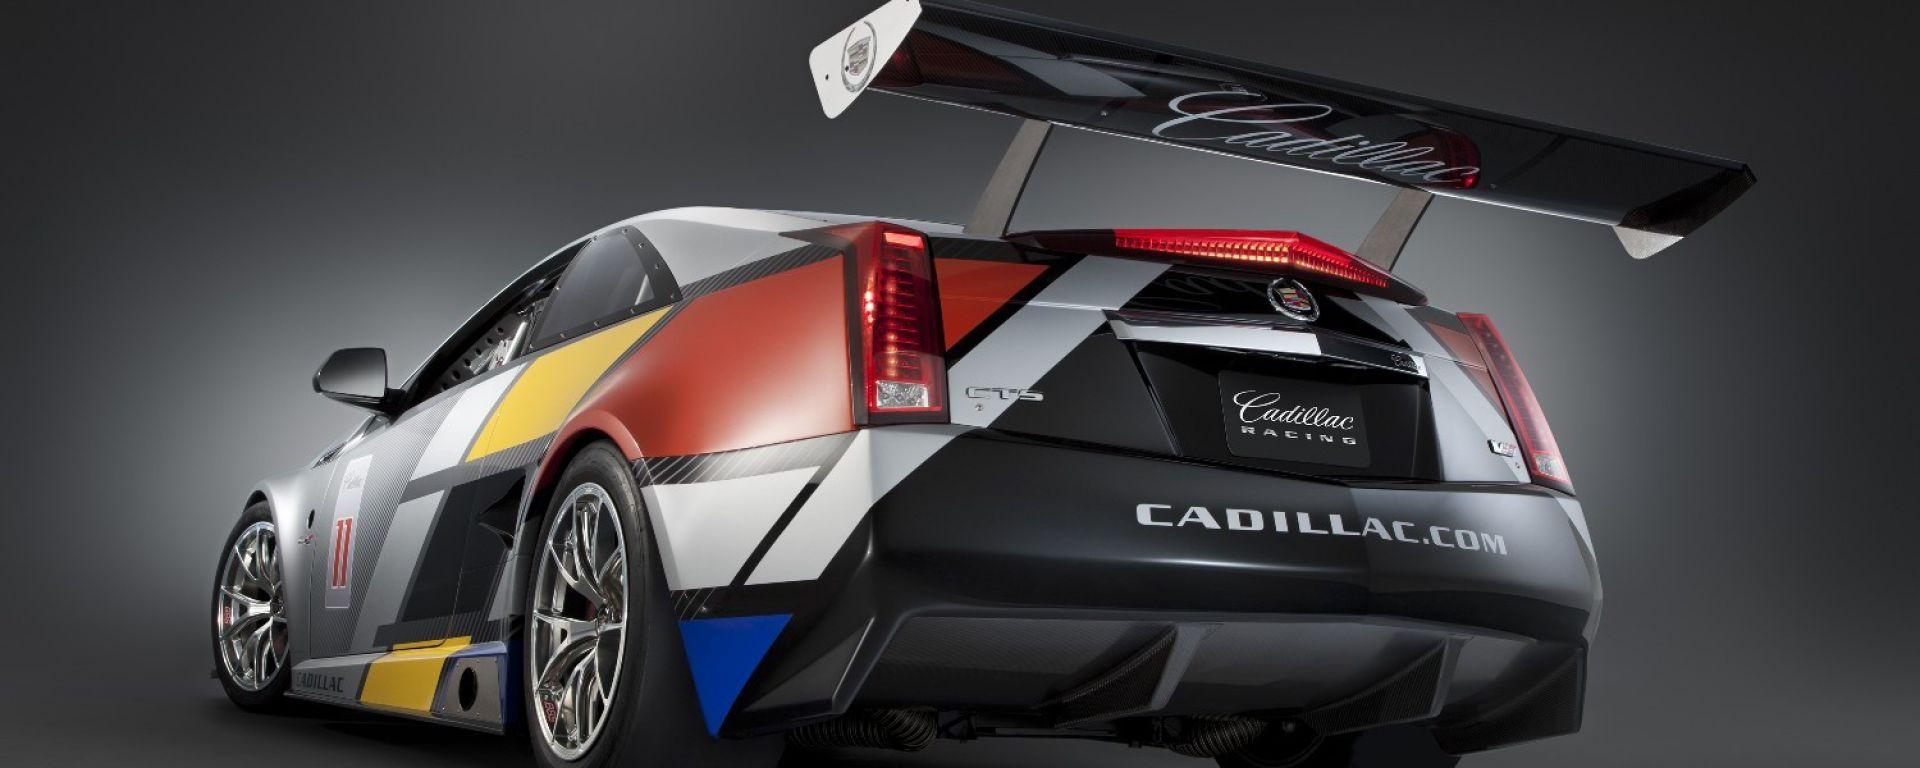 Cadillac CTS-V Coupé GT Racecar: le foto ufficiali